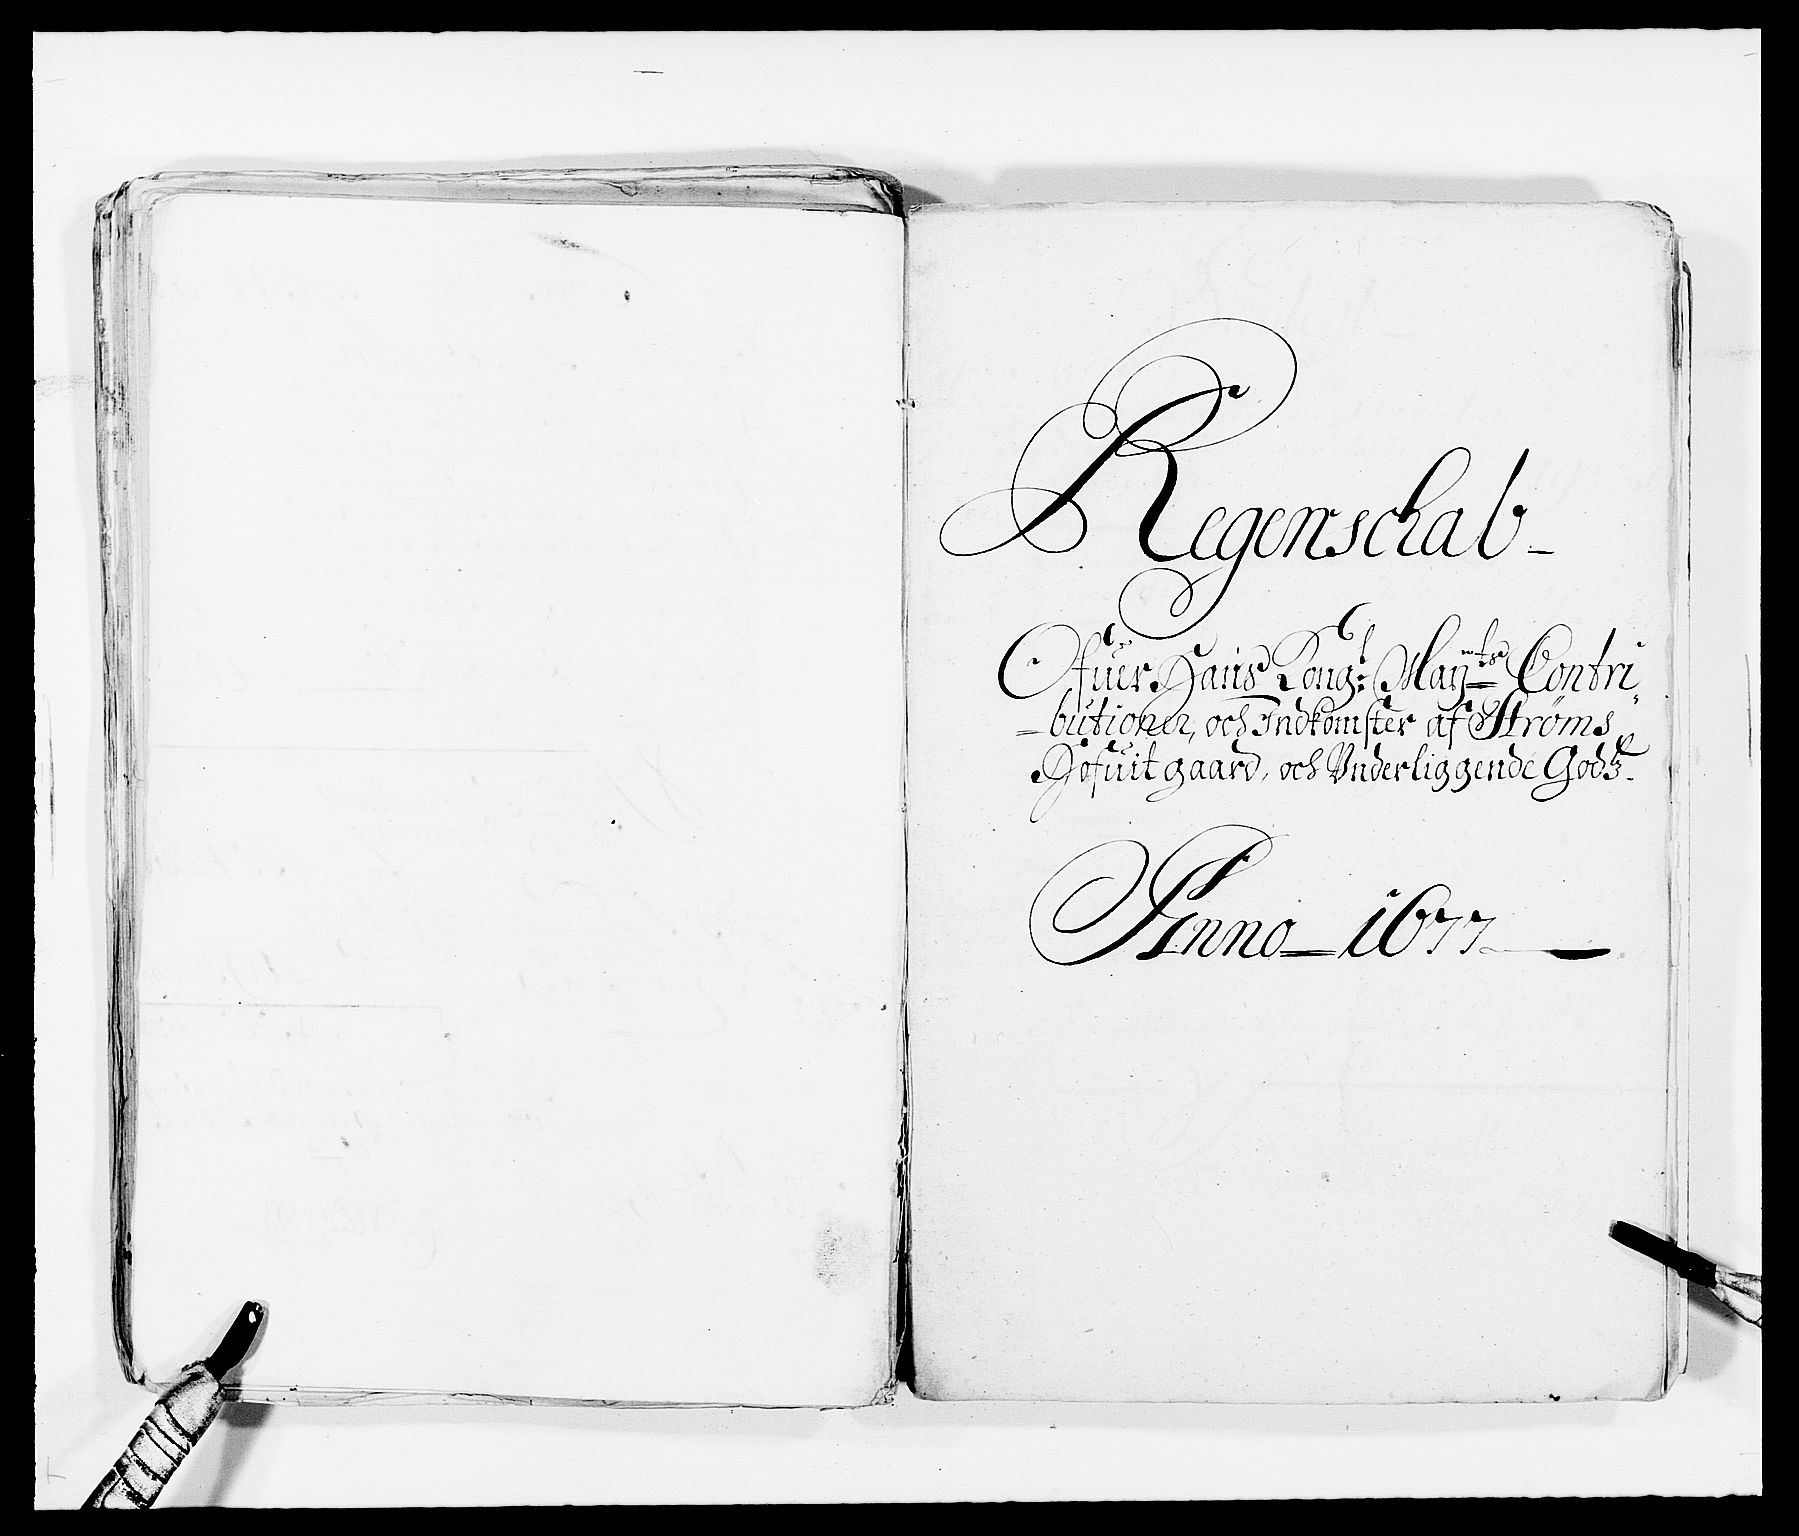 RA, Rentekammeret inntil 1814, Reviderte regnskaper, Fogderegnskap, R32/L1845: Fogderegnskap Jarlsberg grevskap, 1676-1678, s. 70